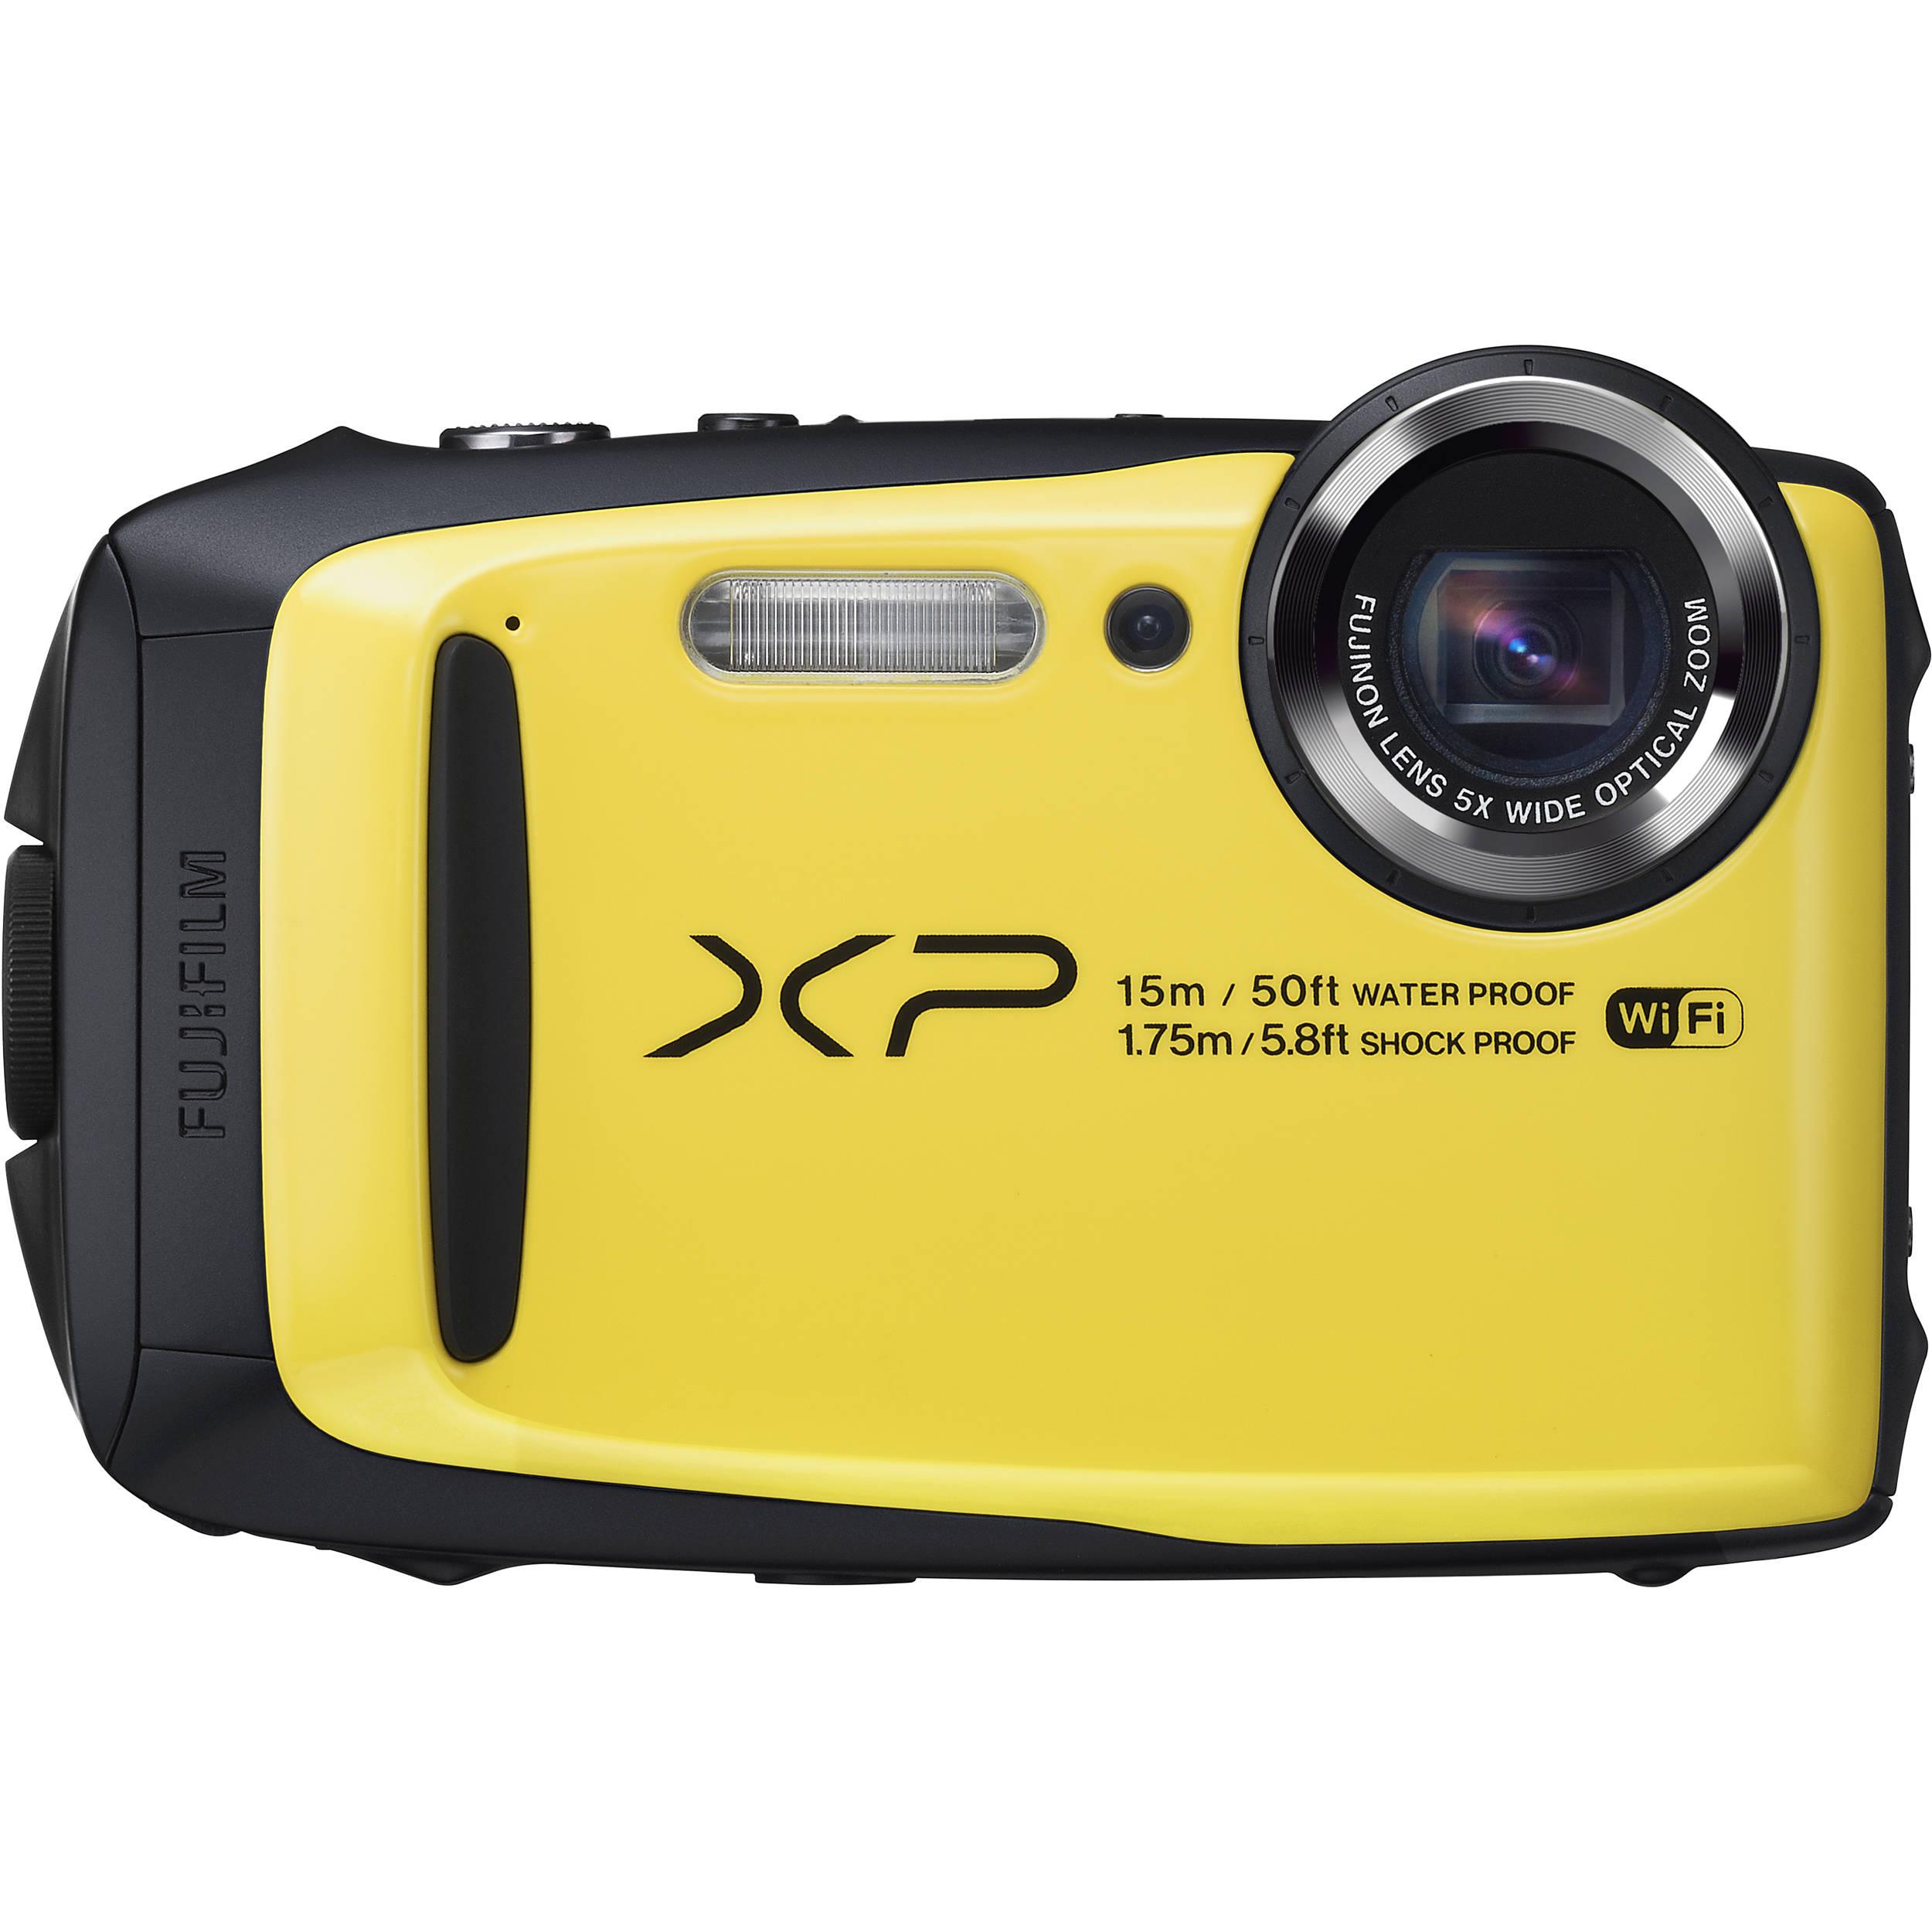 Fujifilm FinePix XP90 Digital Camera (Yellow) 16500466 B&H ...